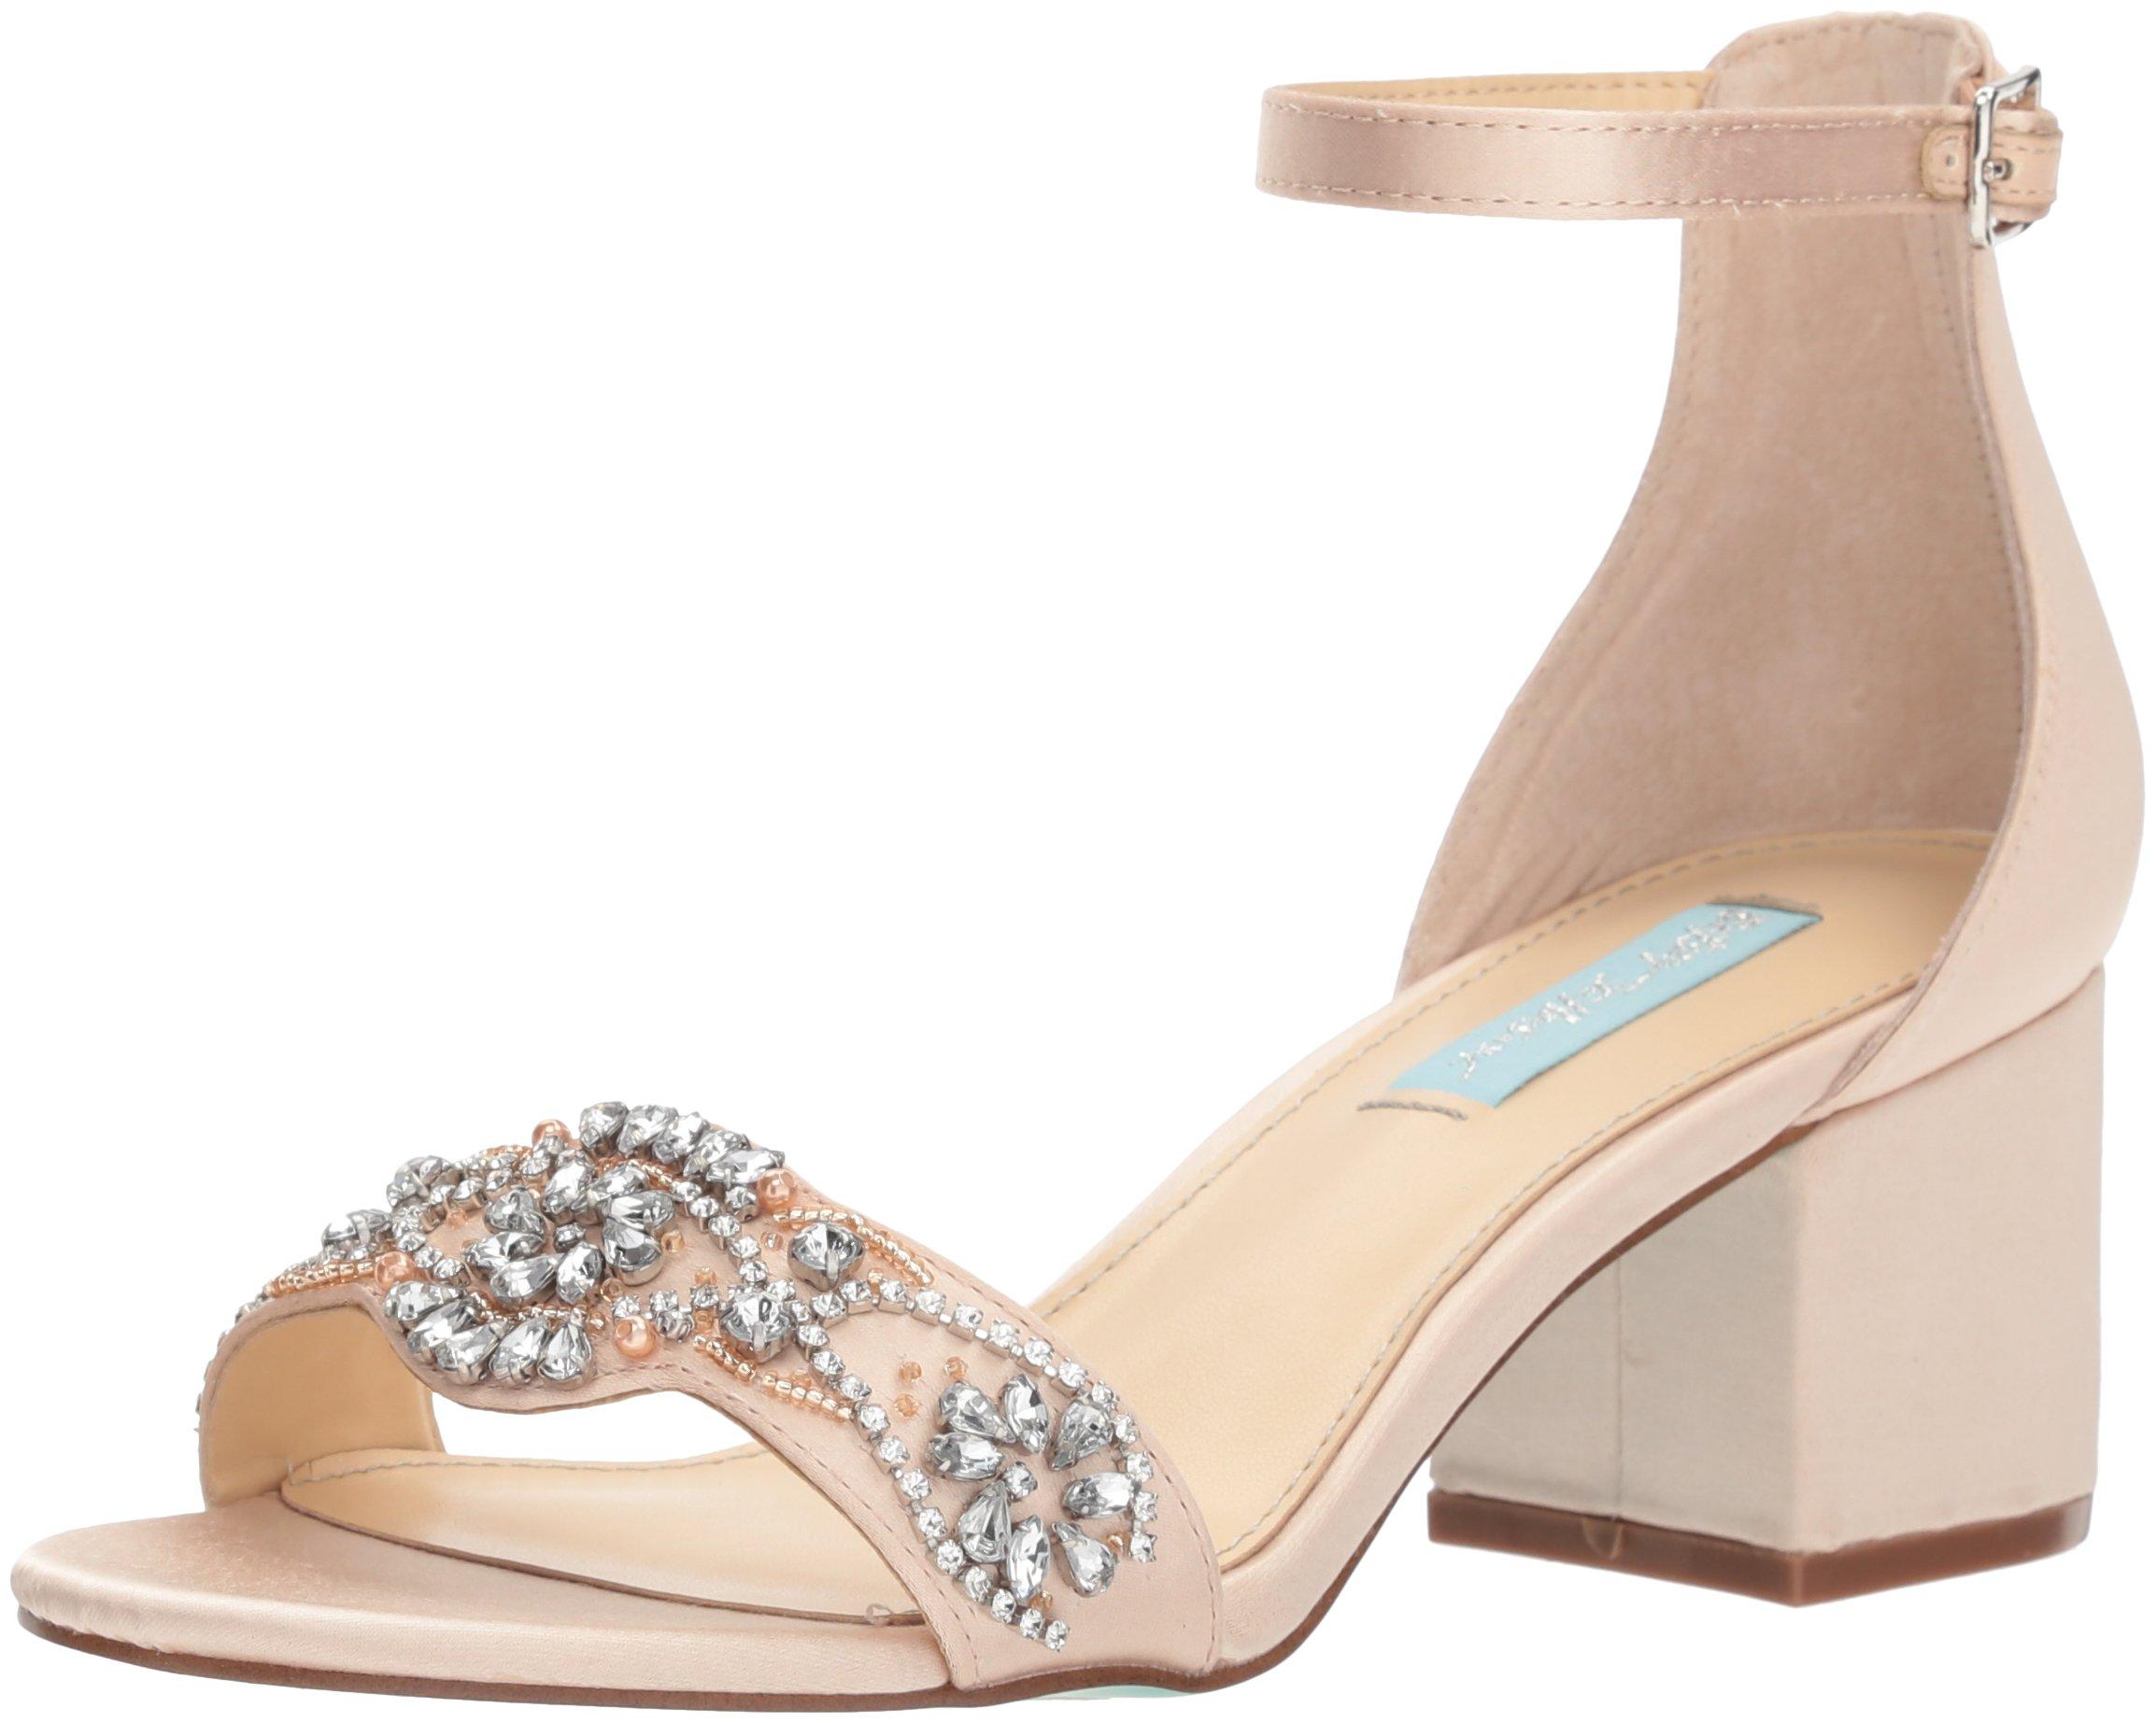 Betsey Johnson Women's SB-Mel Heeled Sandal, Champagne, 7.5 M US